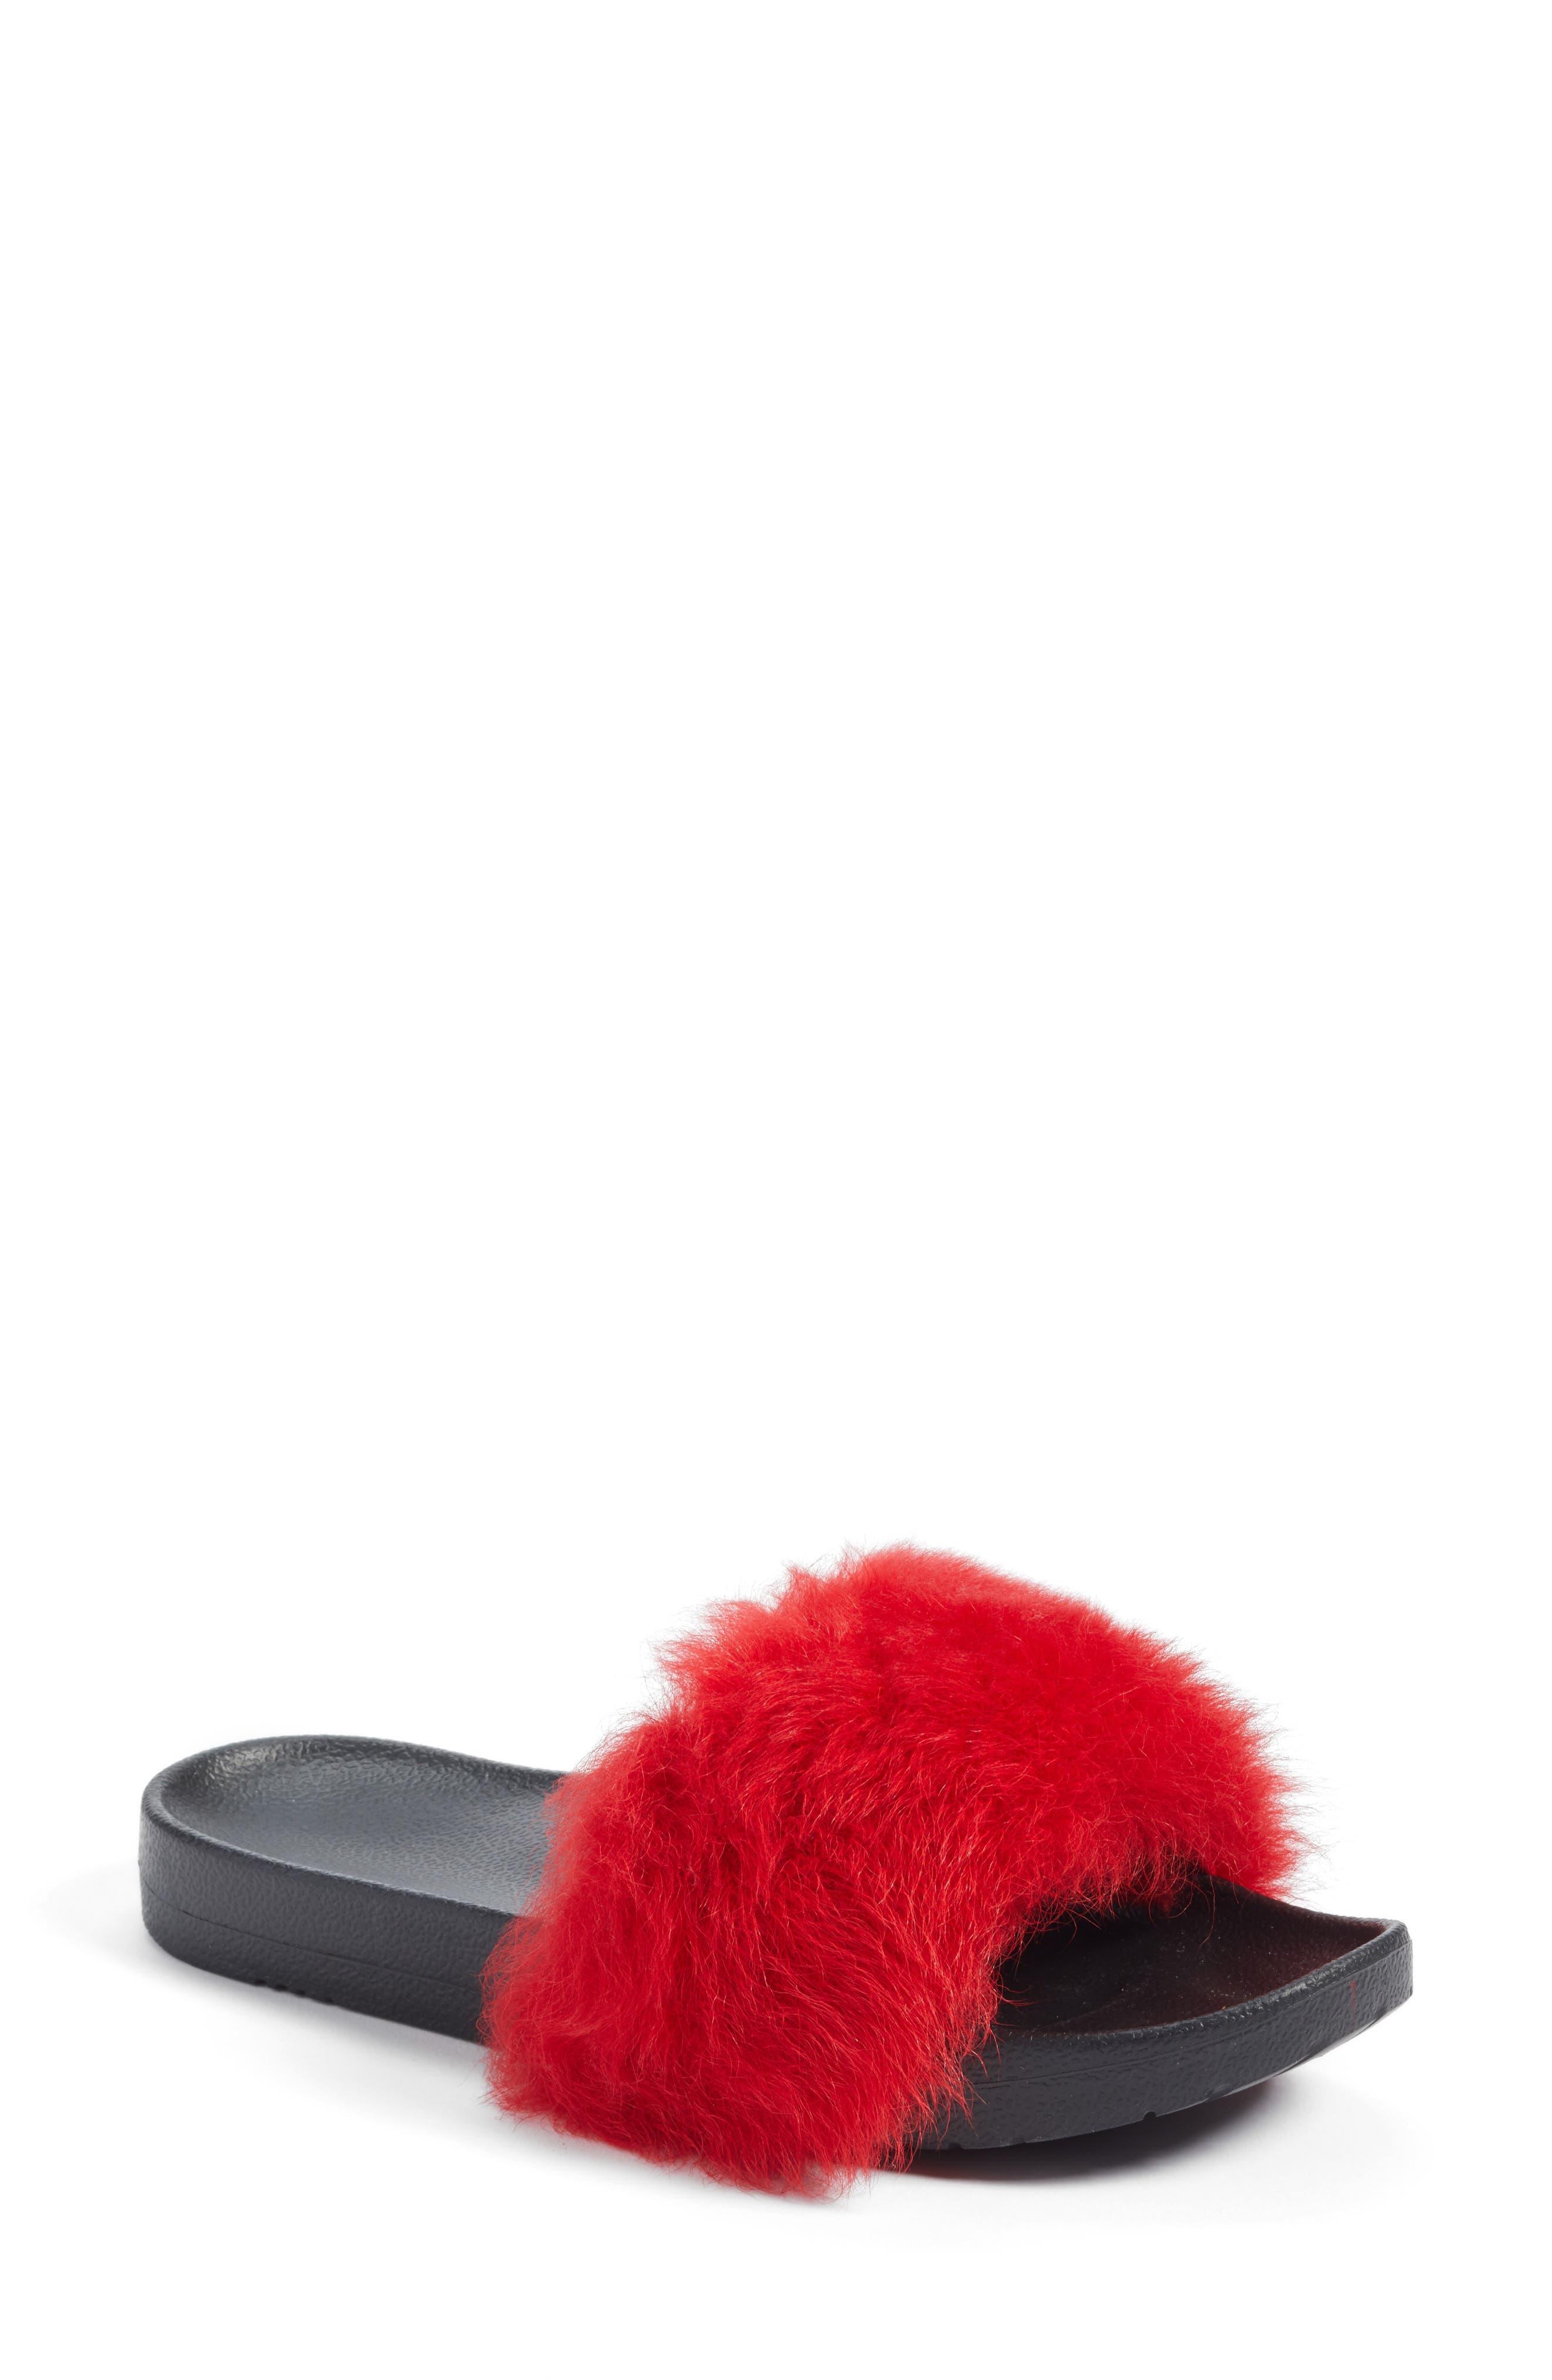 Royale Genuine Shearling Slide Sandal,                             Main thumbnail 1, color,                             627